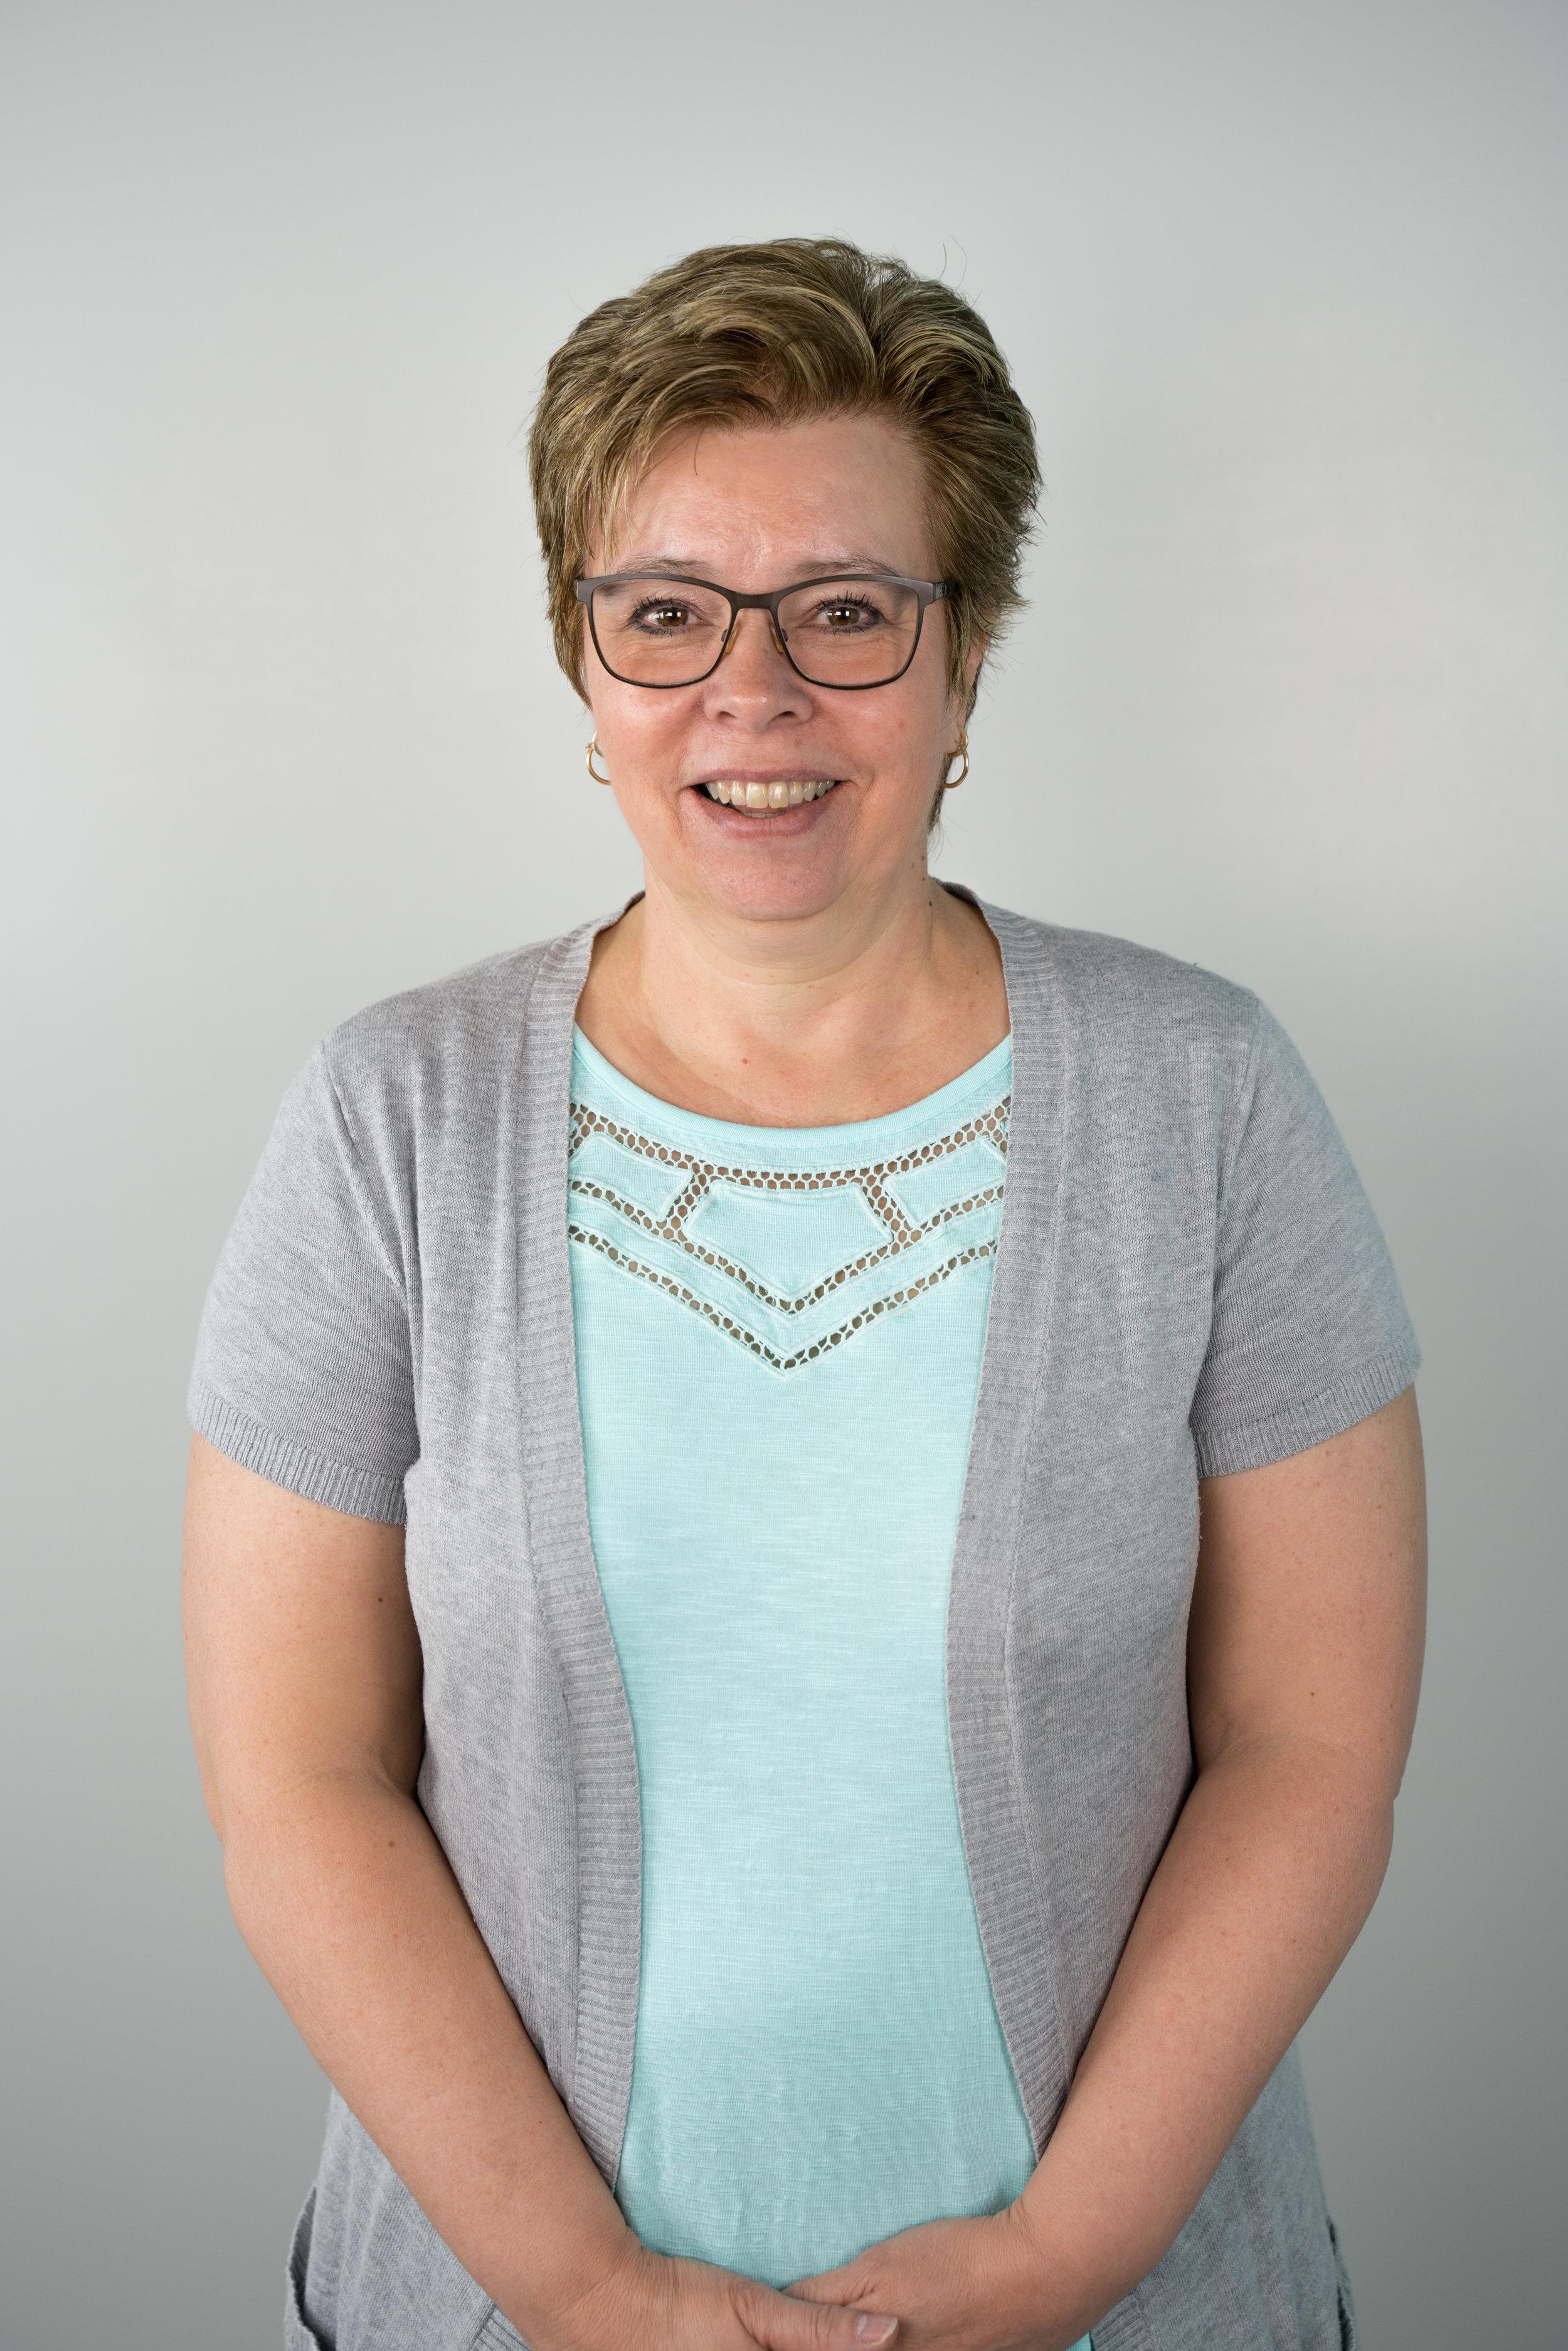 Helen gagnon - Receptionisthelen@bethelsarnia.com